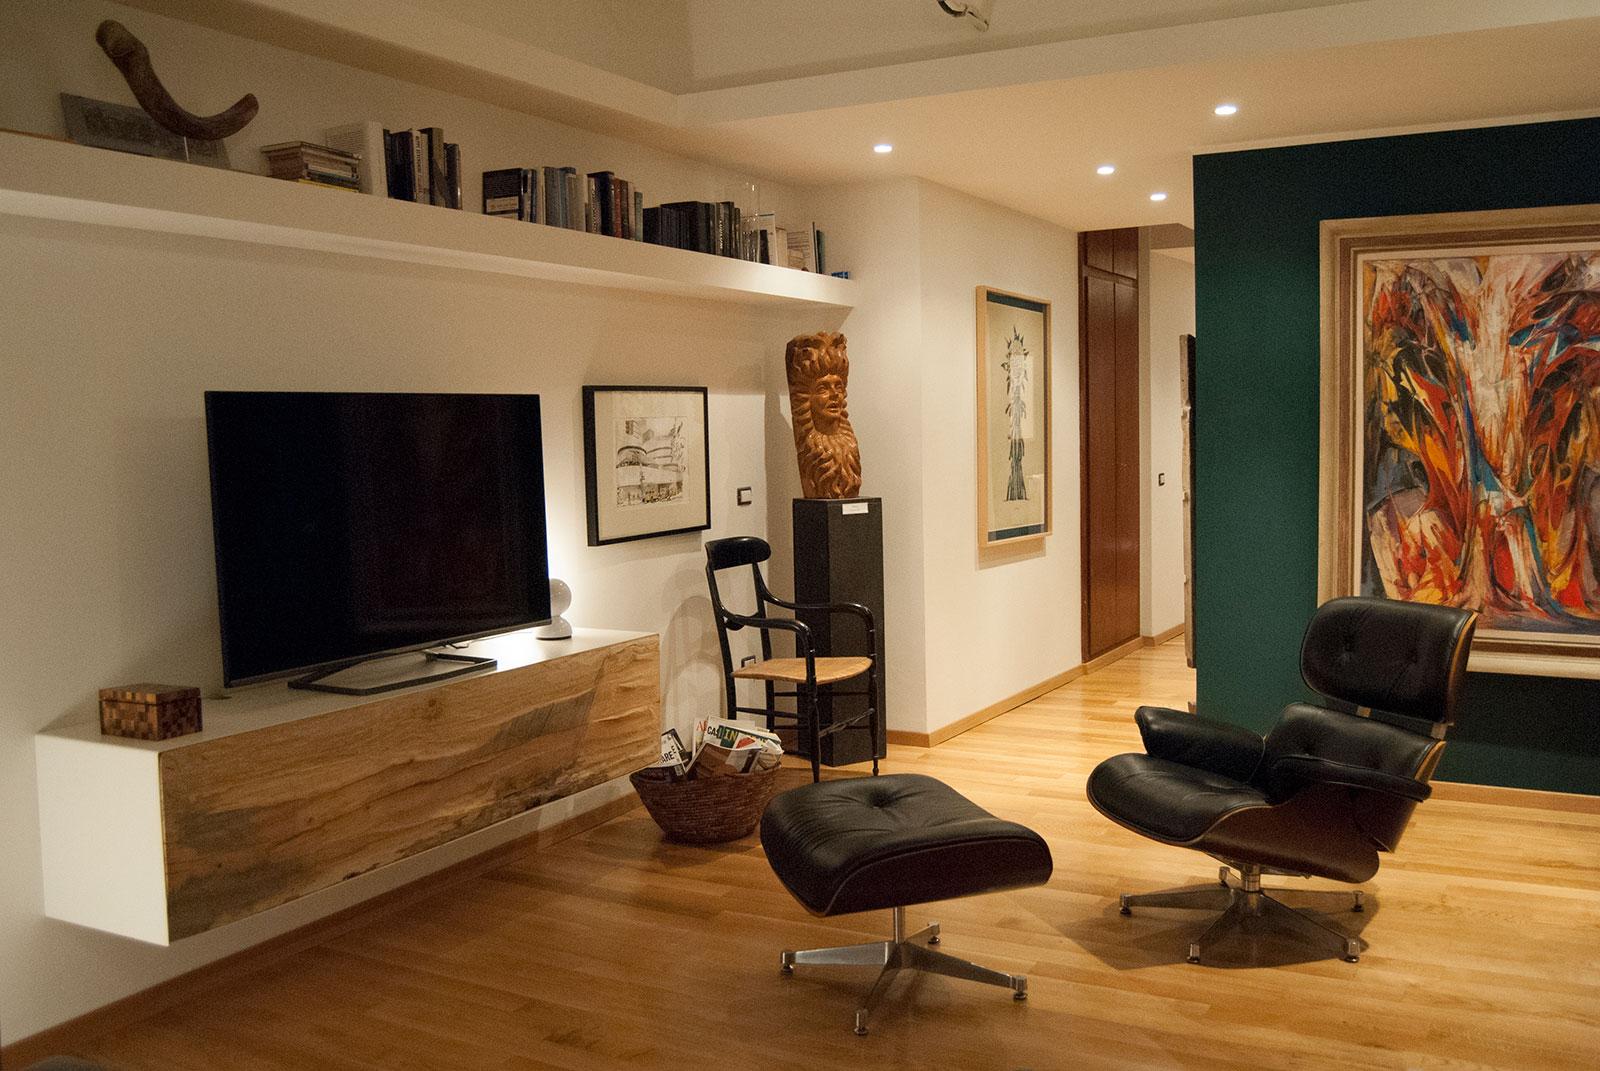 Casa al mare caspardesign studio - Arredare casa piccola moderna ...